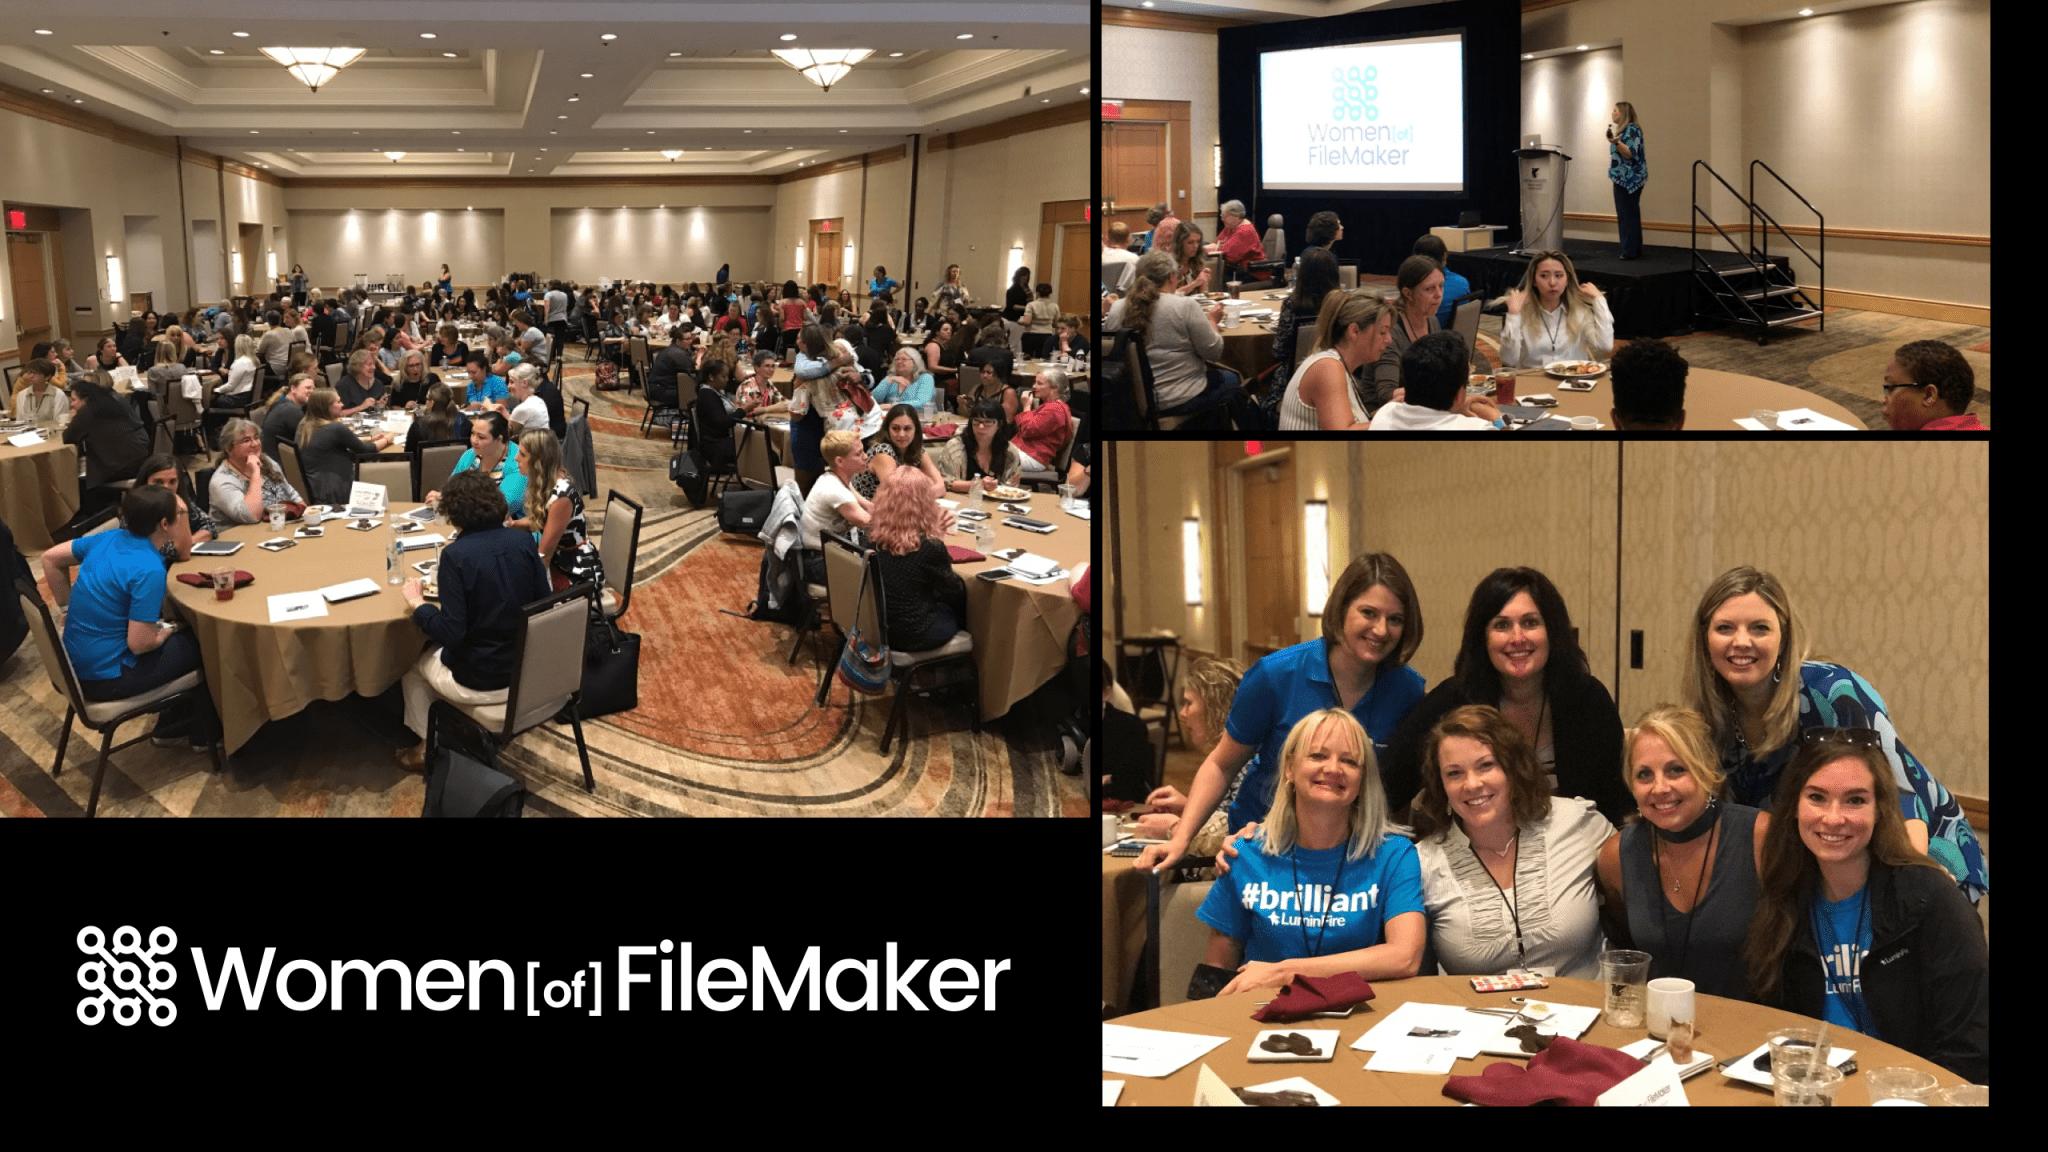 FileMaker DevCon 2017 Roundup 1